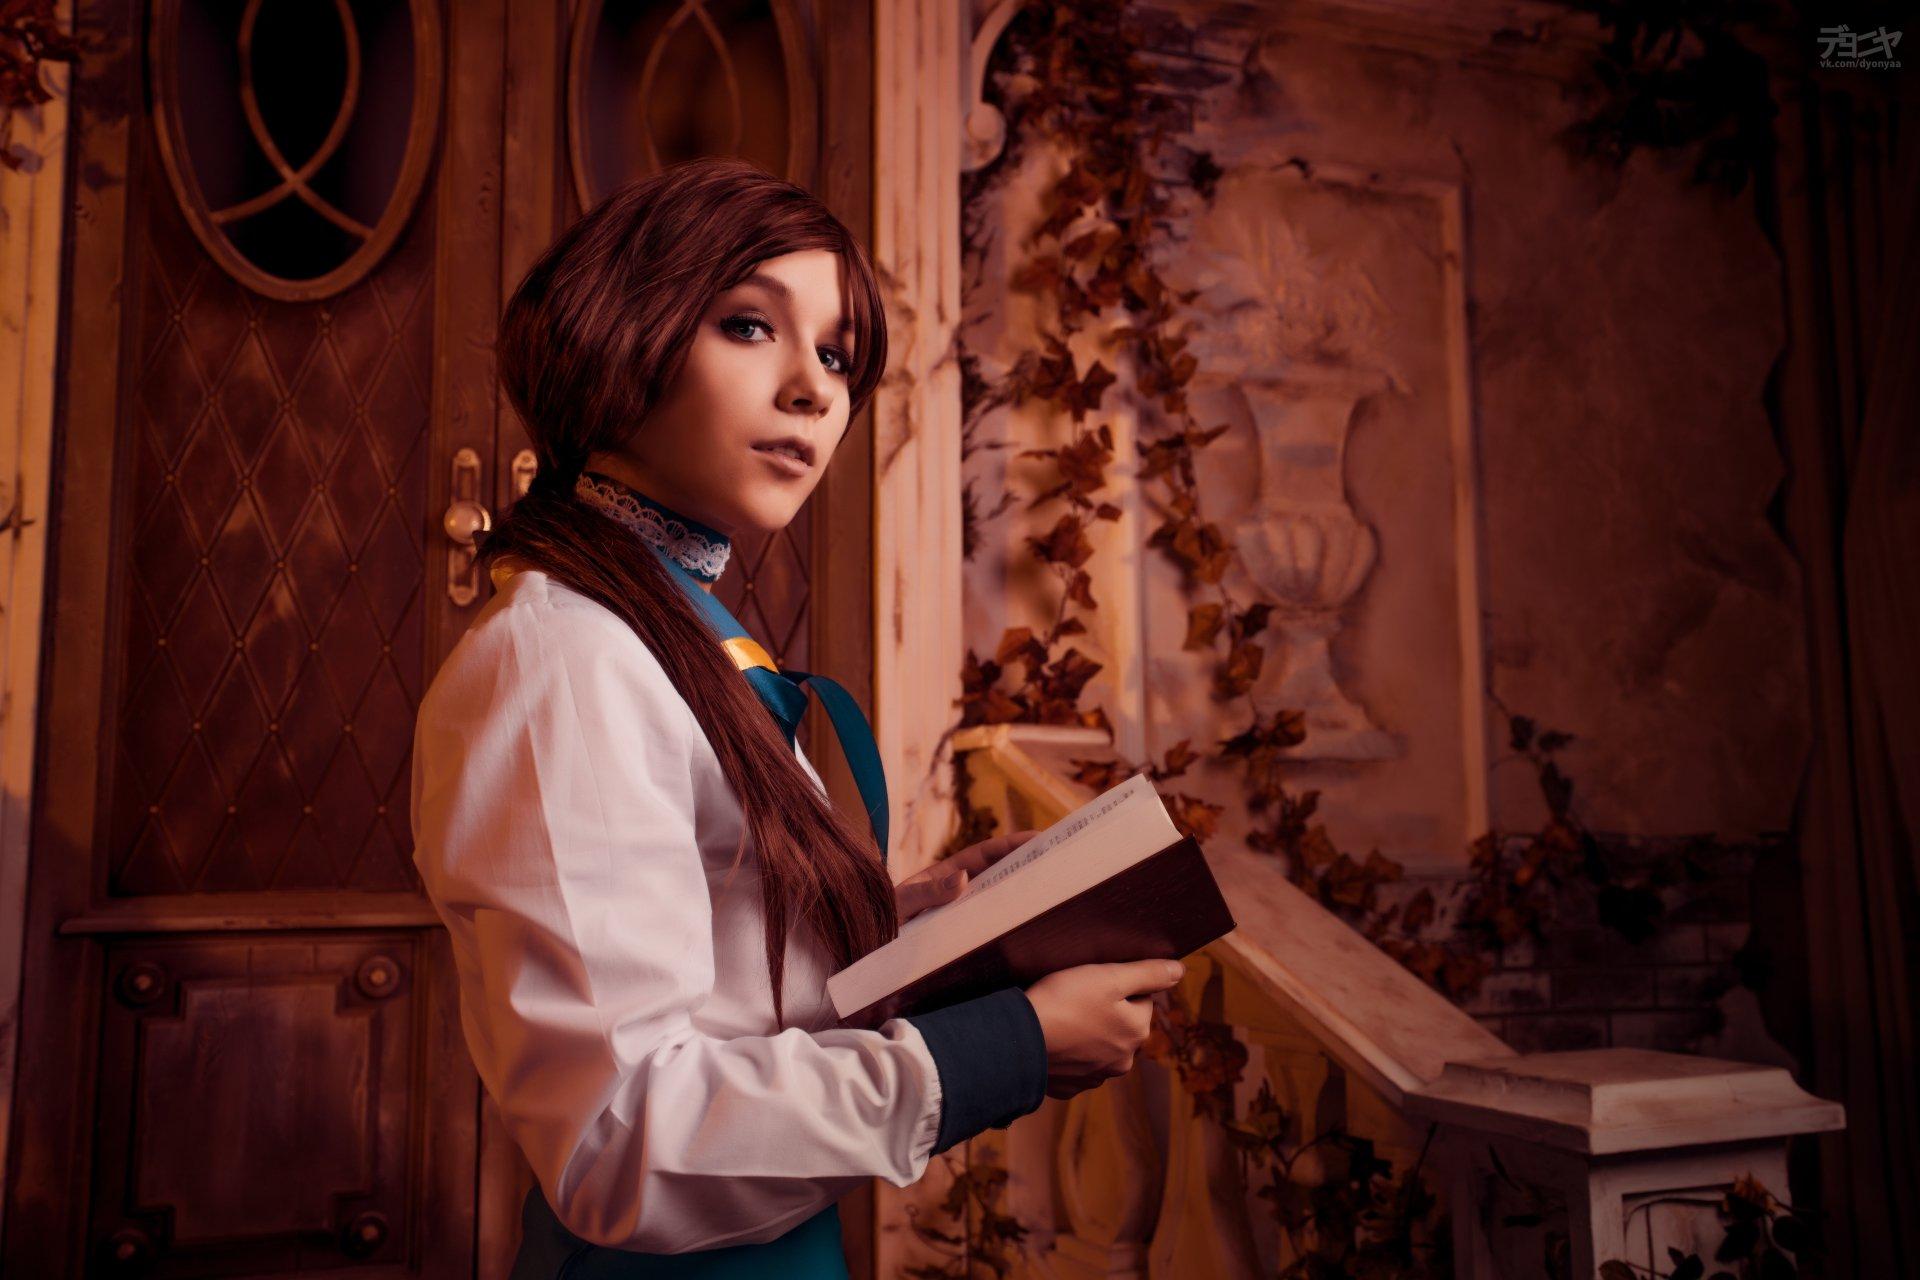 Women - Cosplay  Bioshock Infinite Elizabeth (Bioshock Infinite) Wallpaper